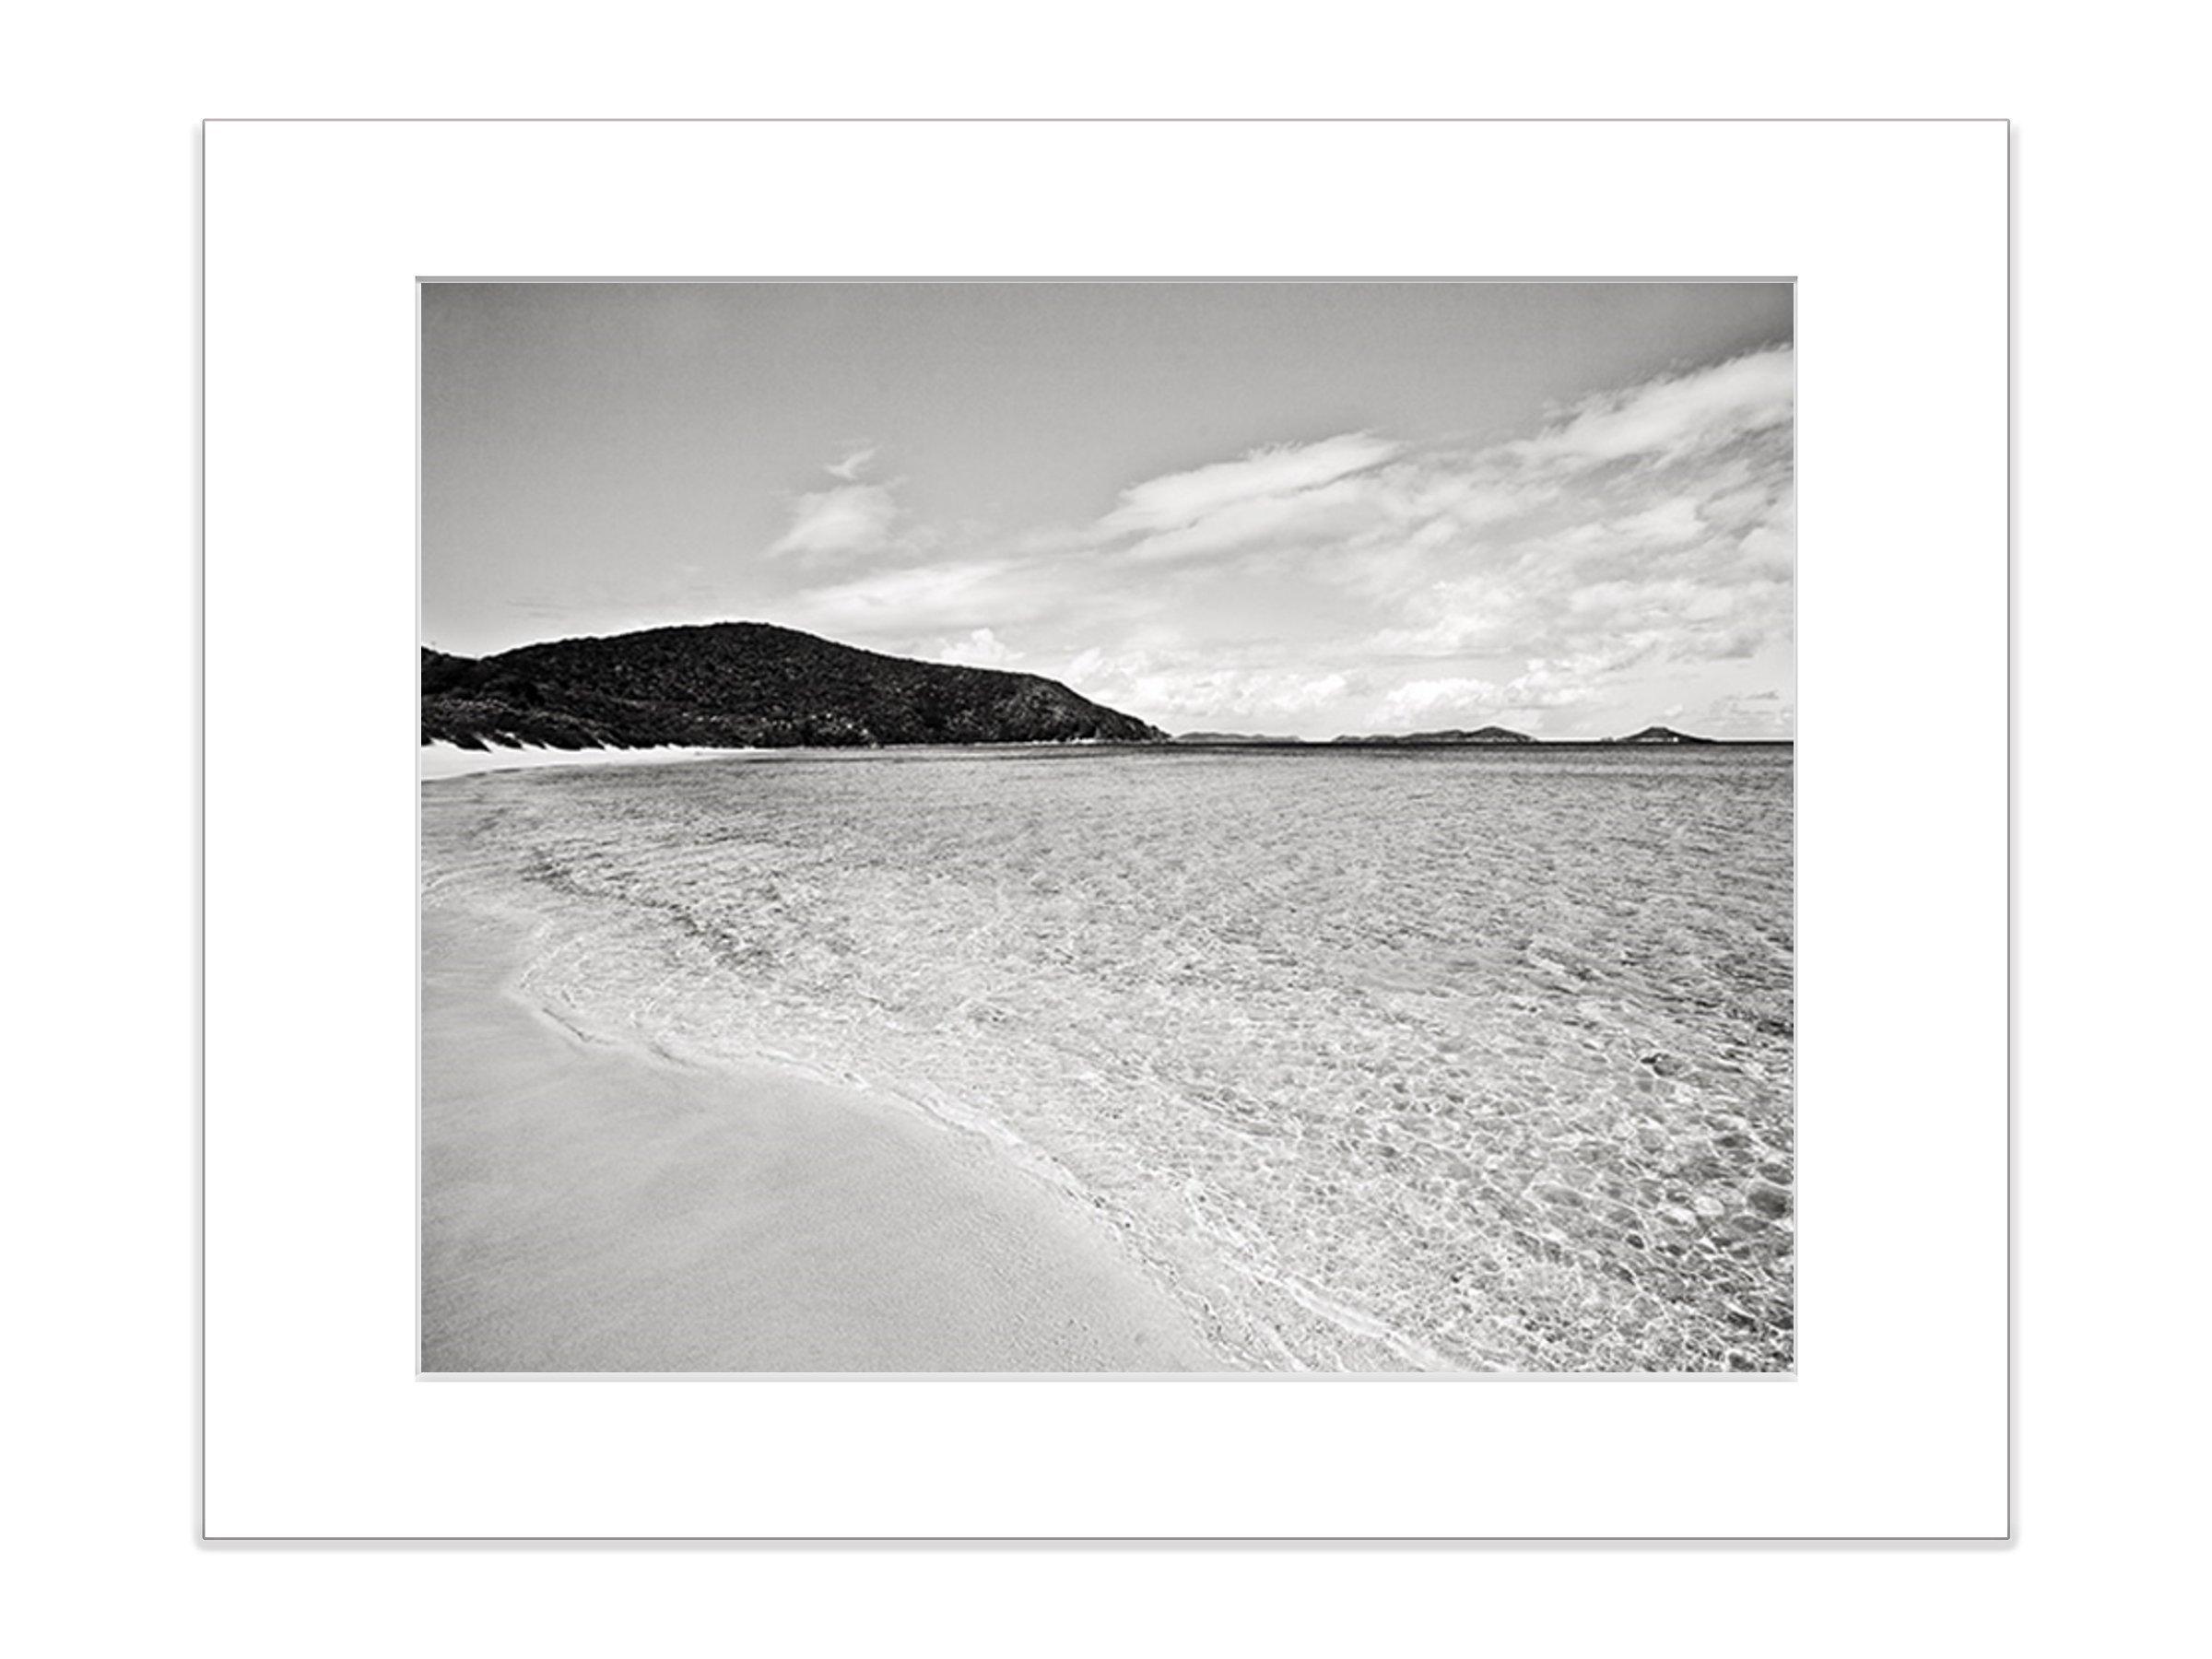 Black and White Coastal Beach Wall Decor 8x10 Inch Matted Photo Print